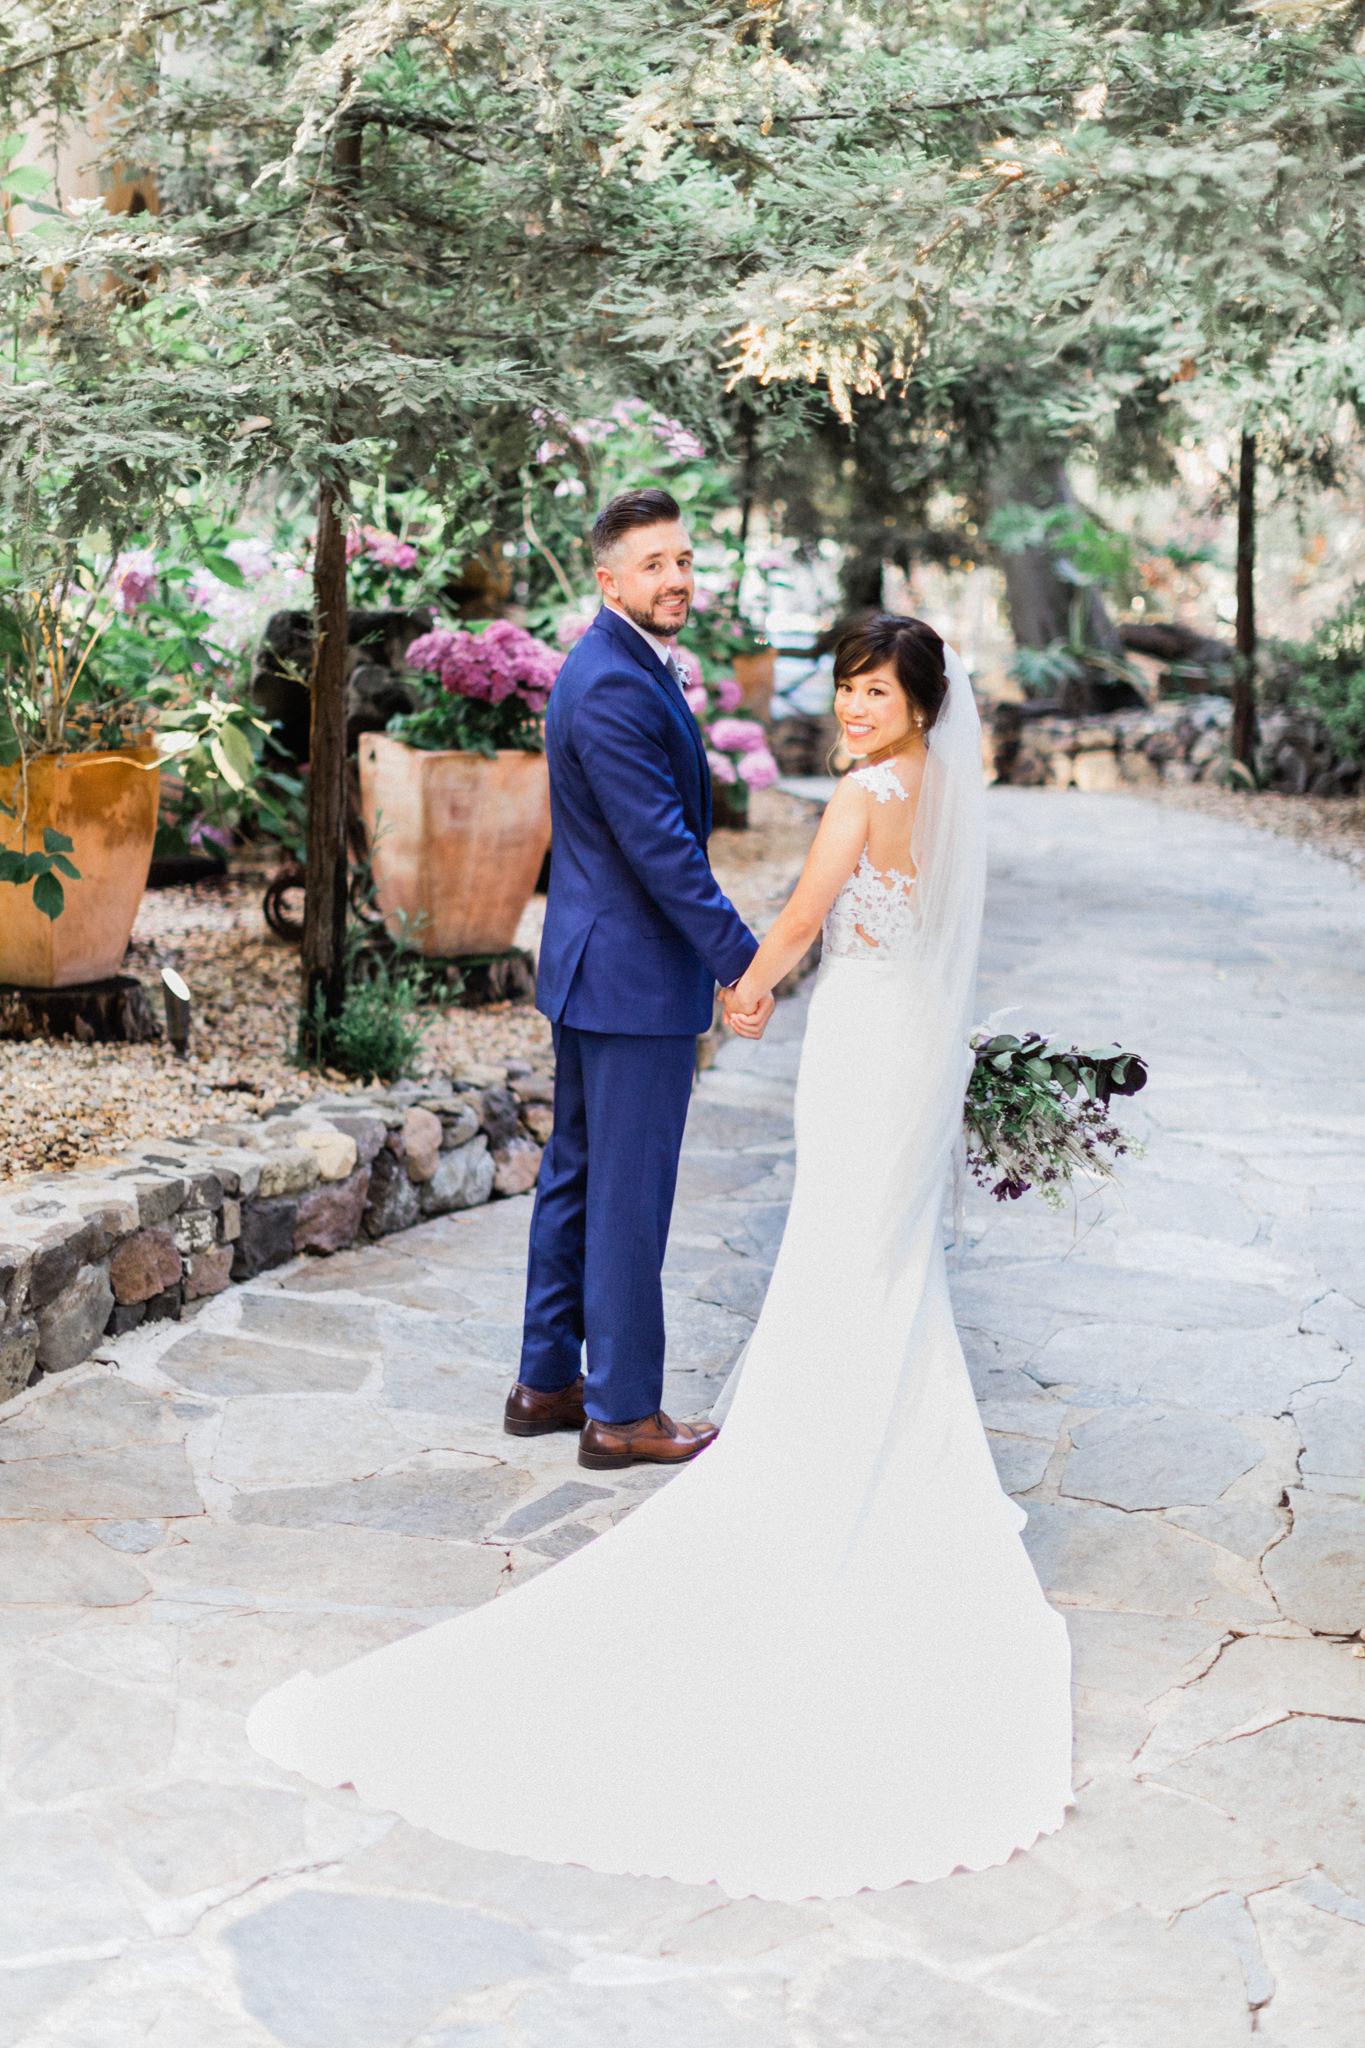 Calamigos-Ranch-Malibu-Wedding-Photographer-192.jpg